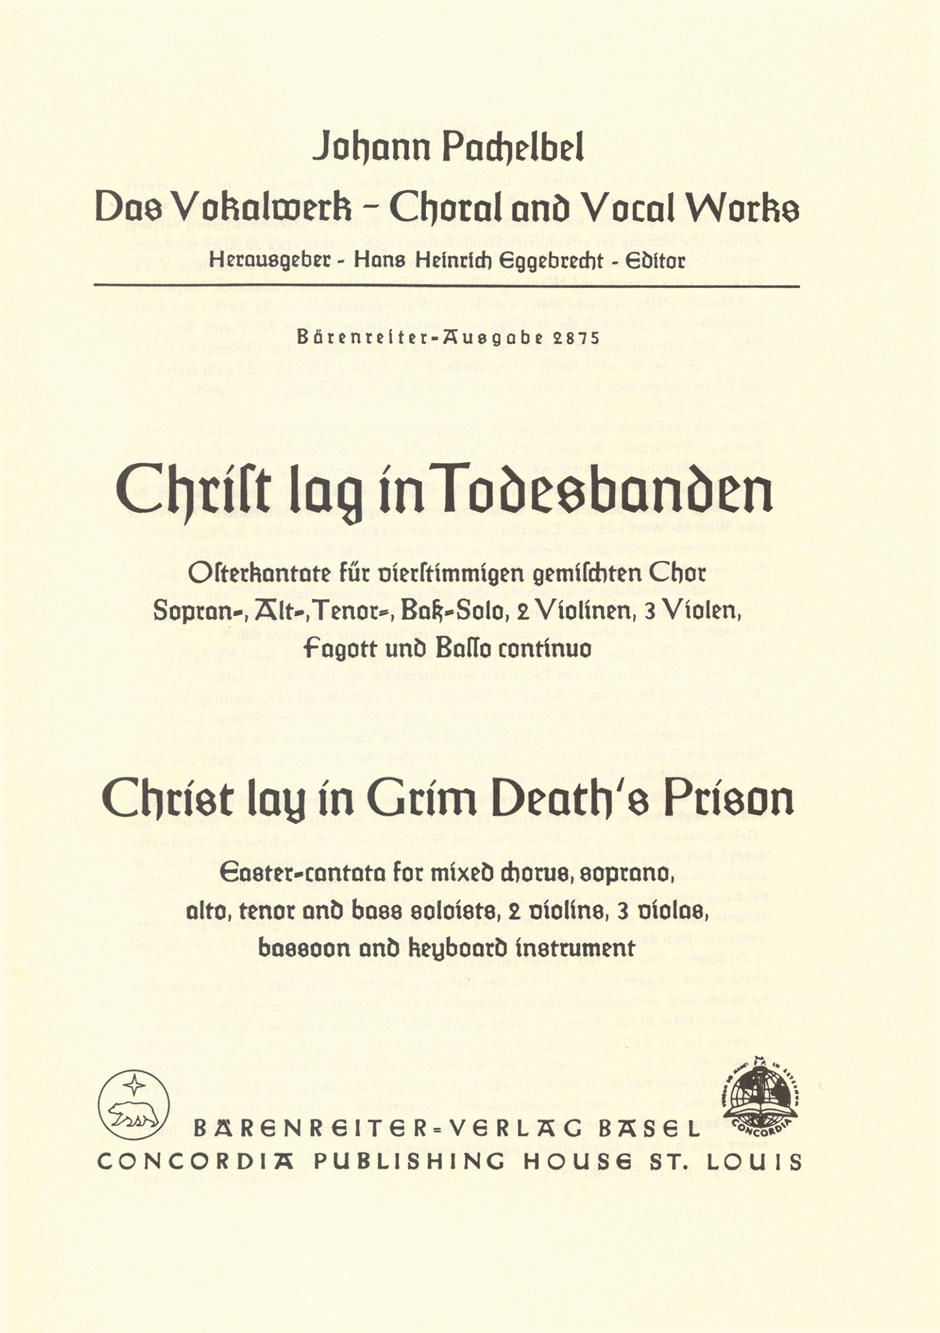 Christ lay in grim death's prison